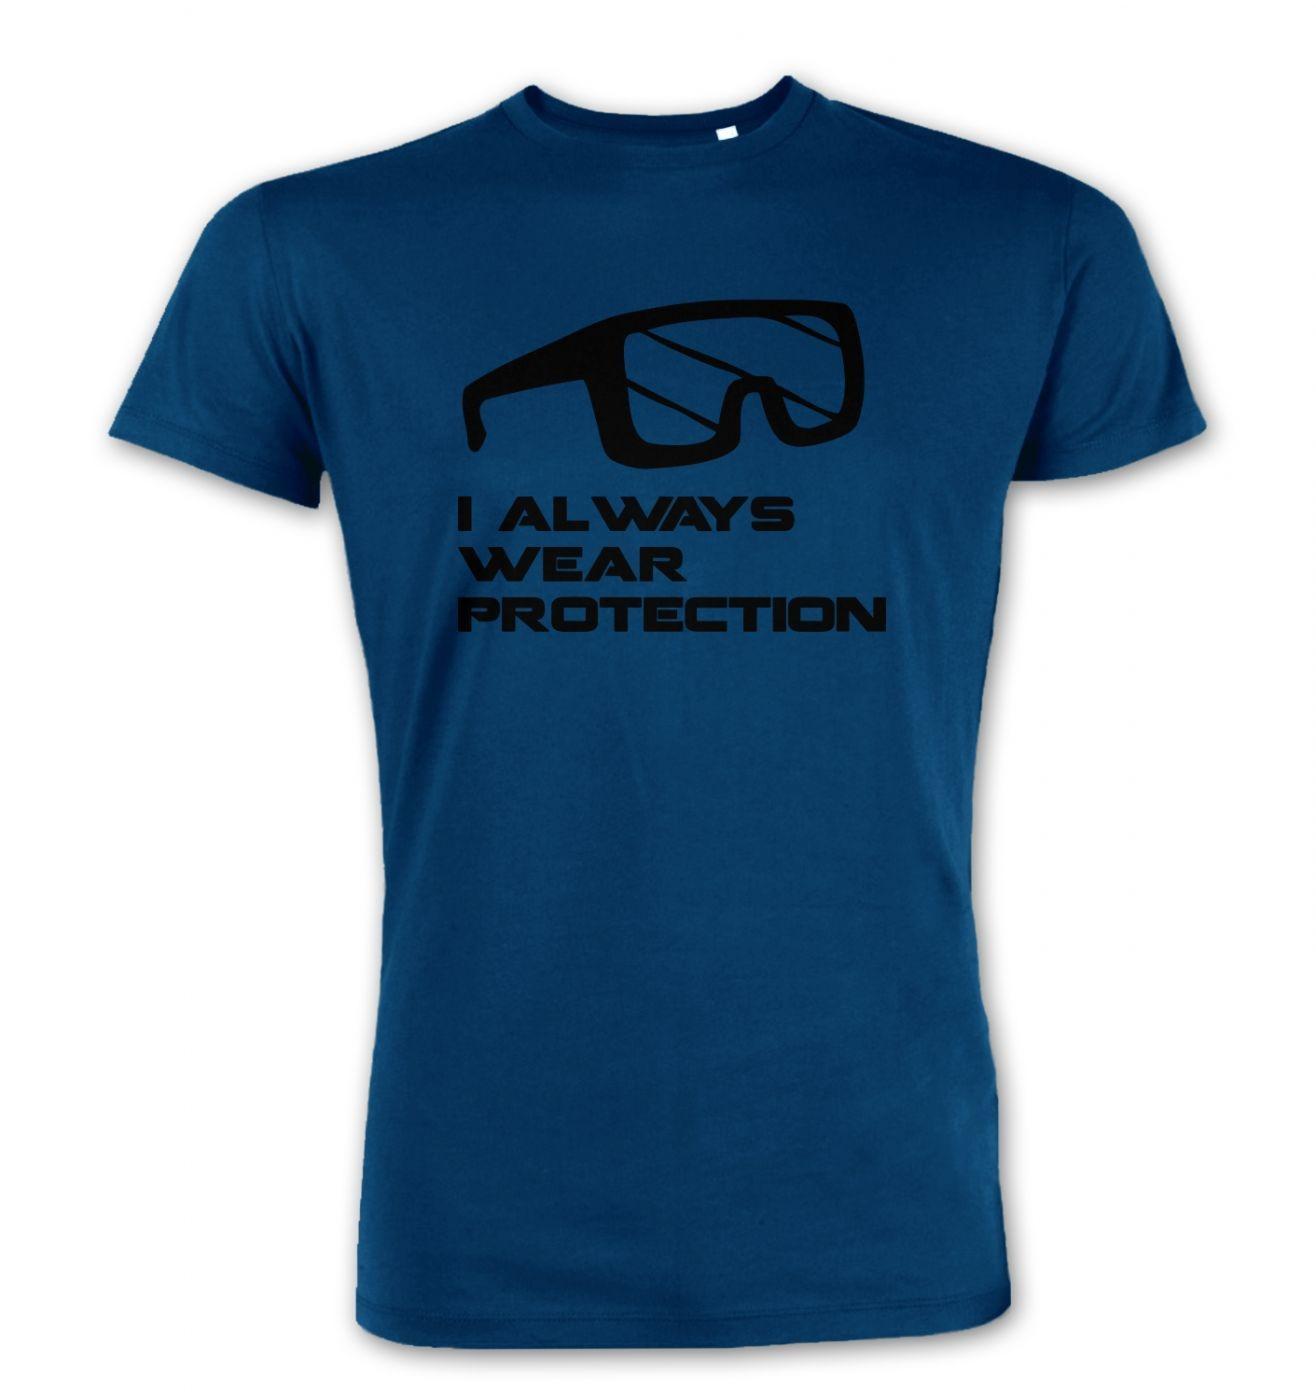 I Always Wear Protection Premium t-shirt